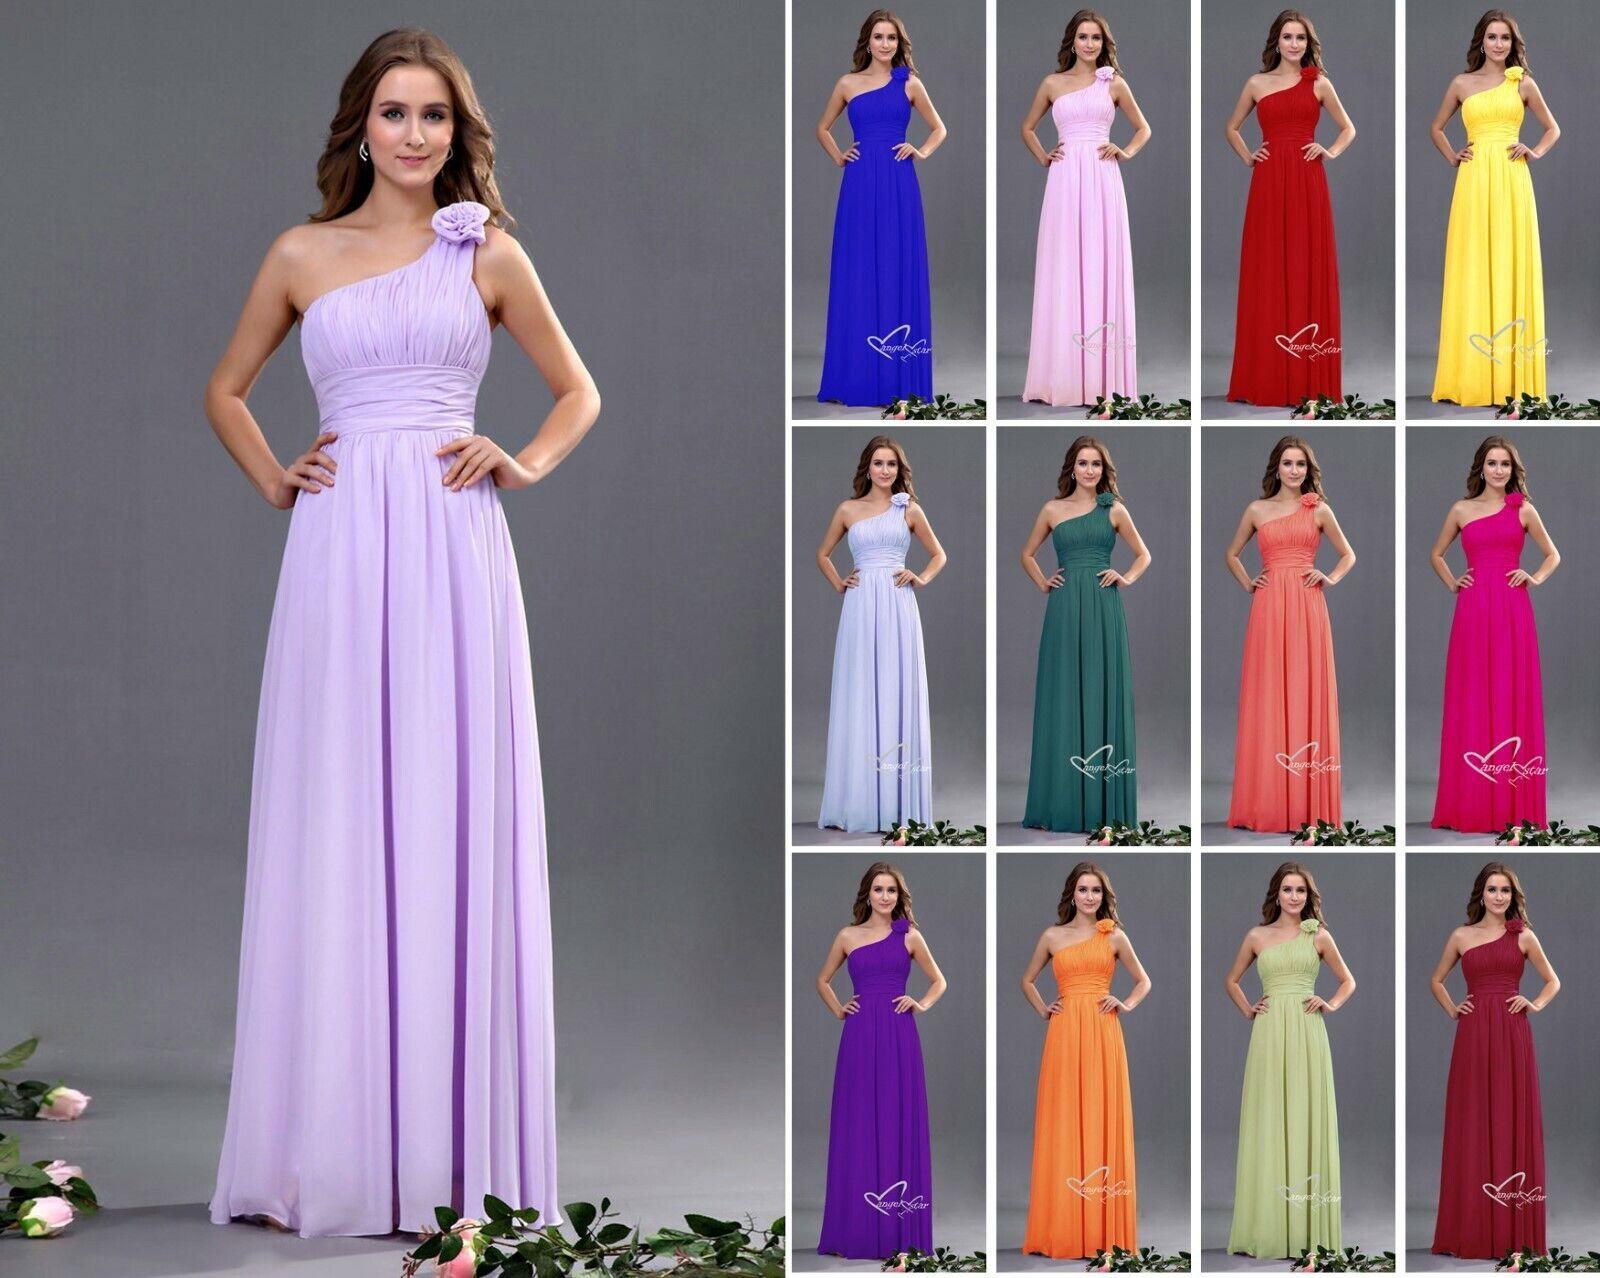 New Chiffon One Shoulder Floor length Evening Wedding Party Ball Grown Dress